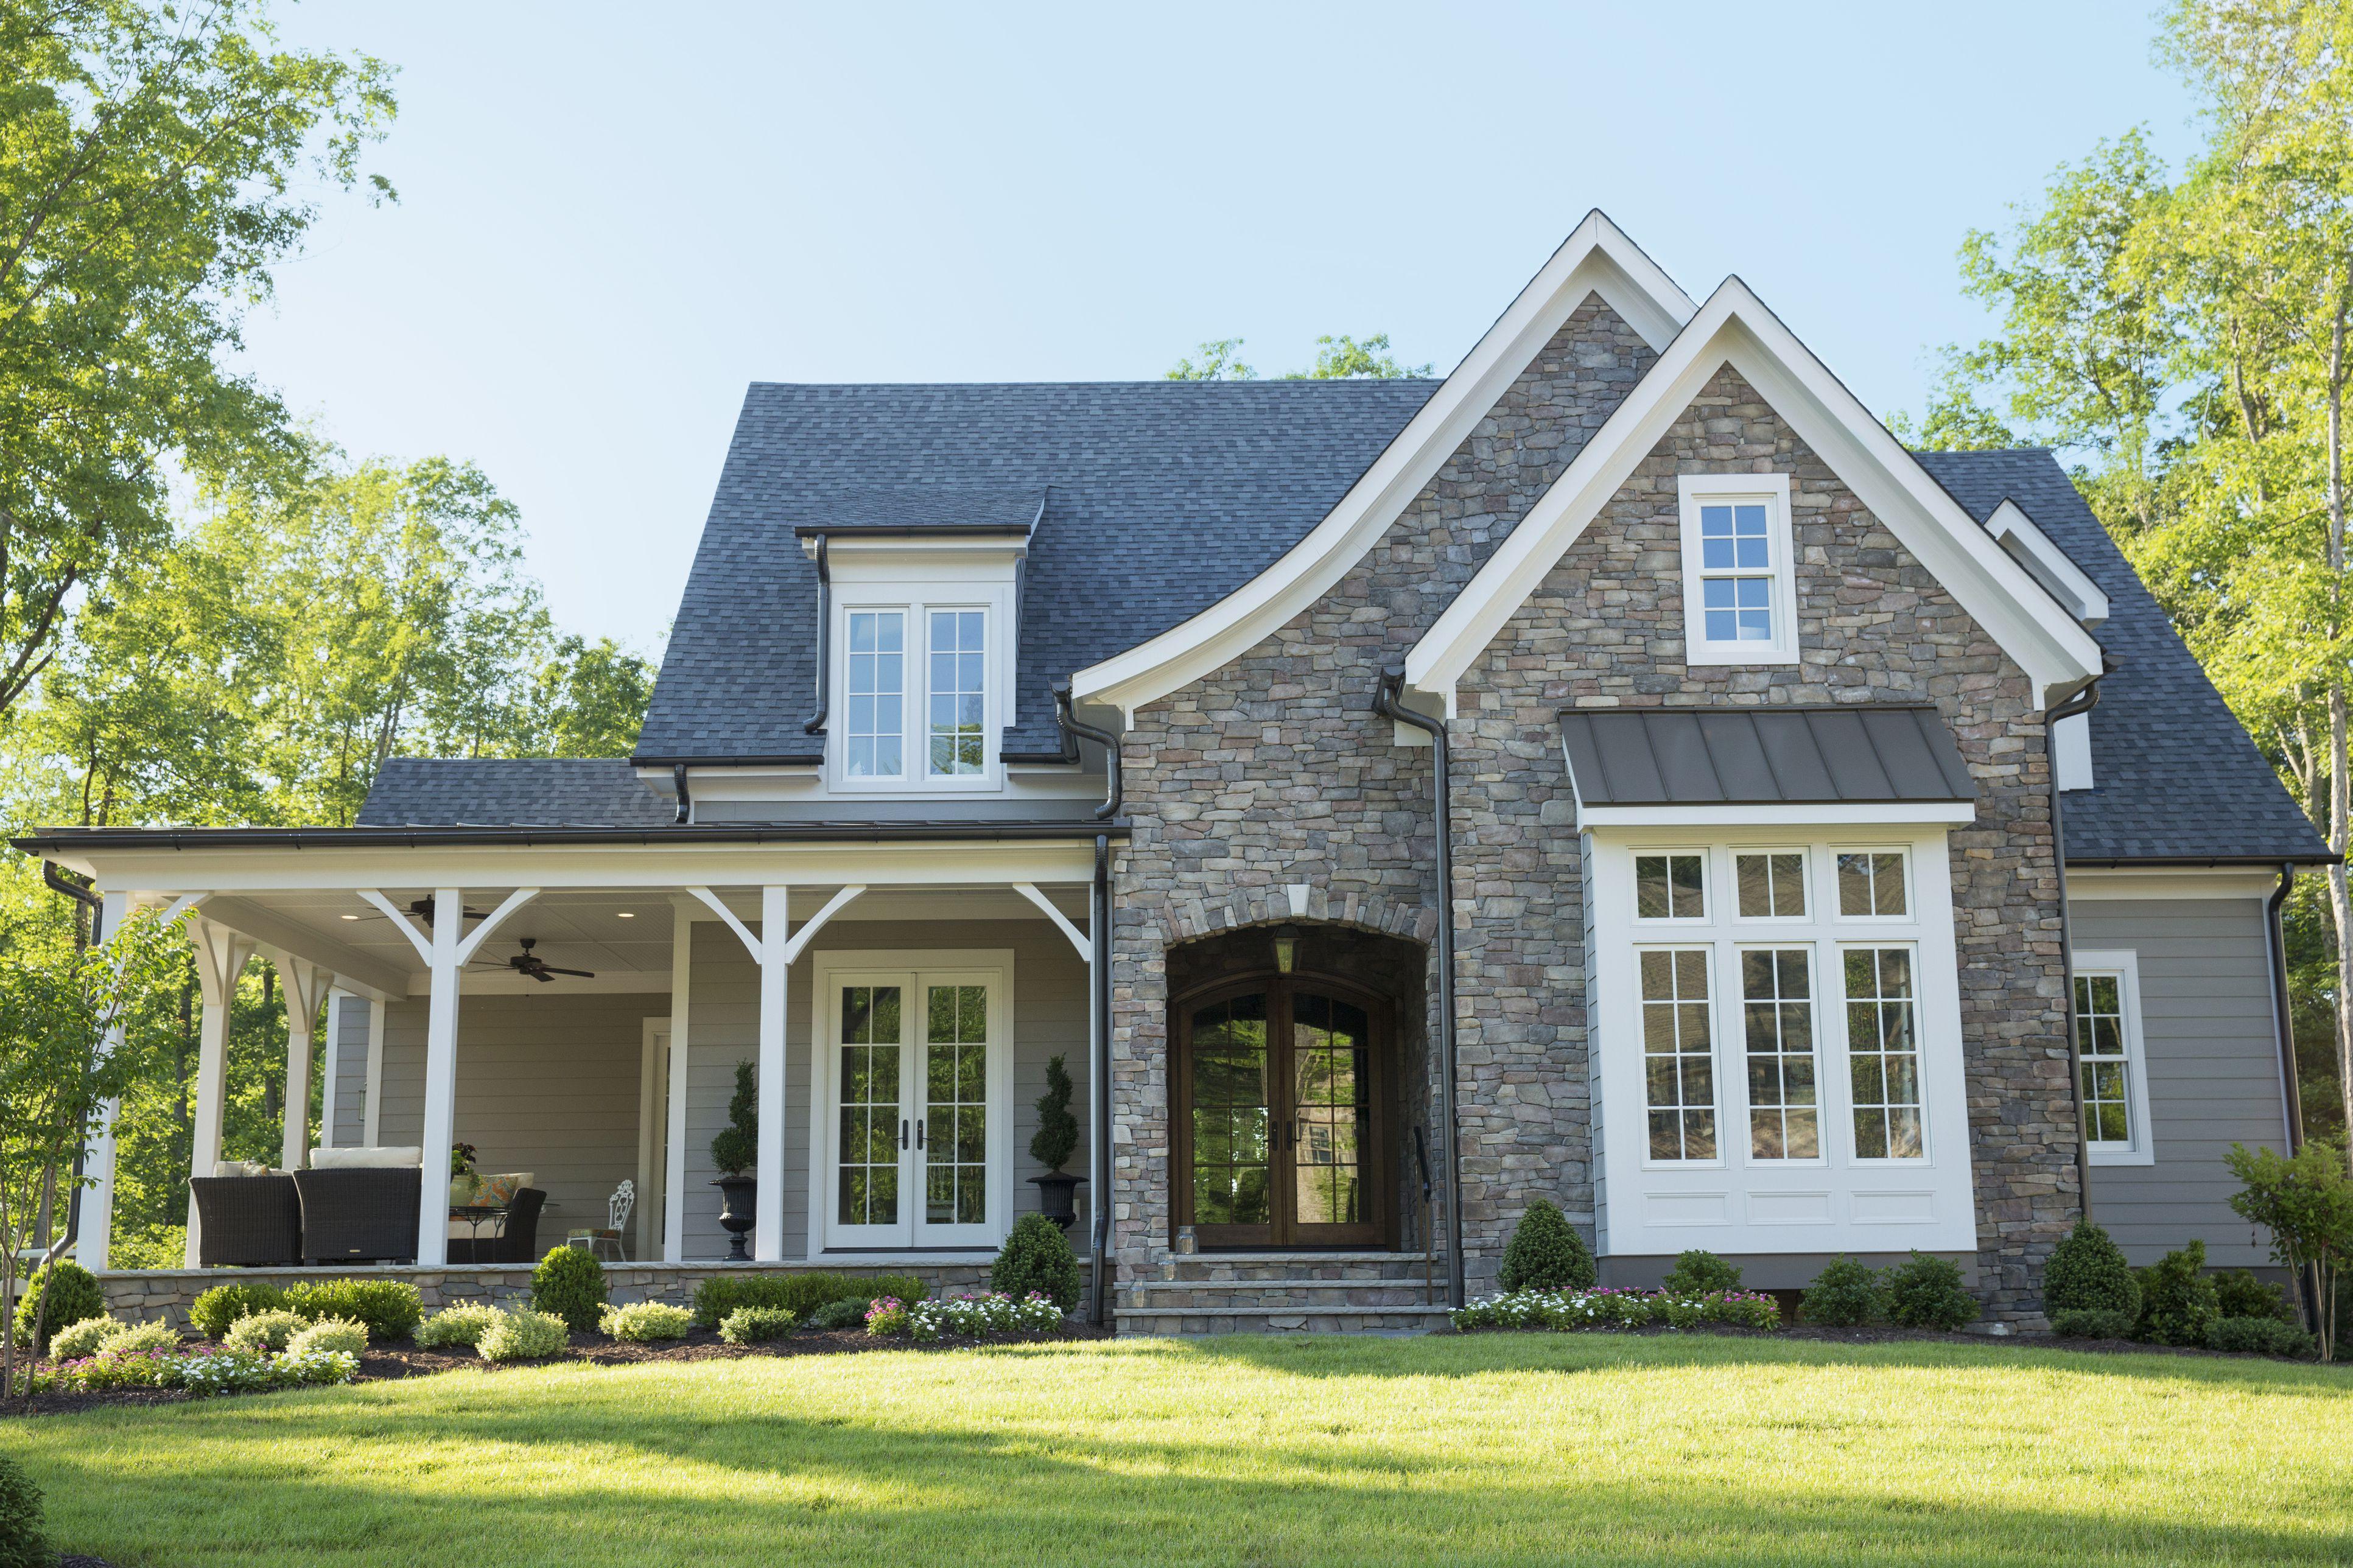 Exterior house siding and repair tutorials for Exterior house repair